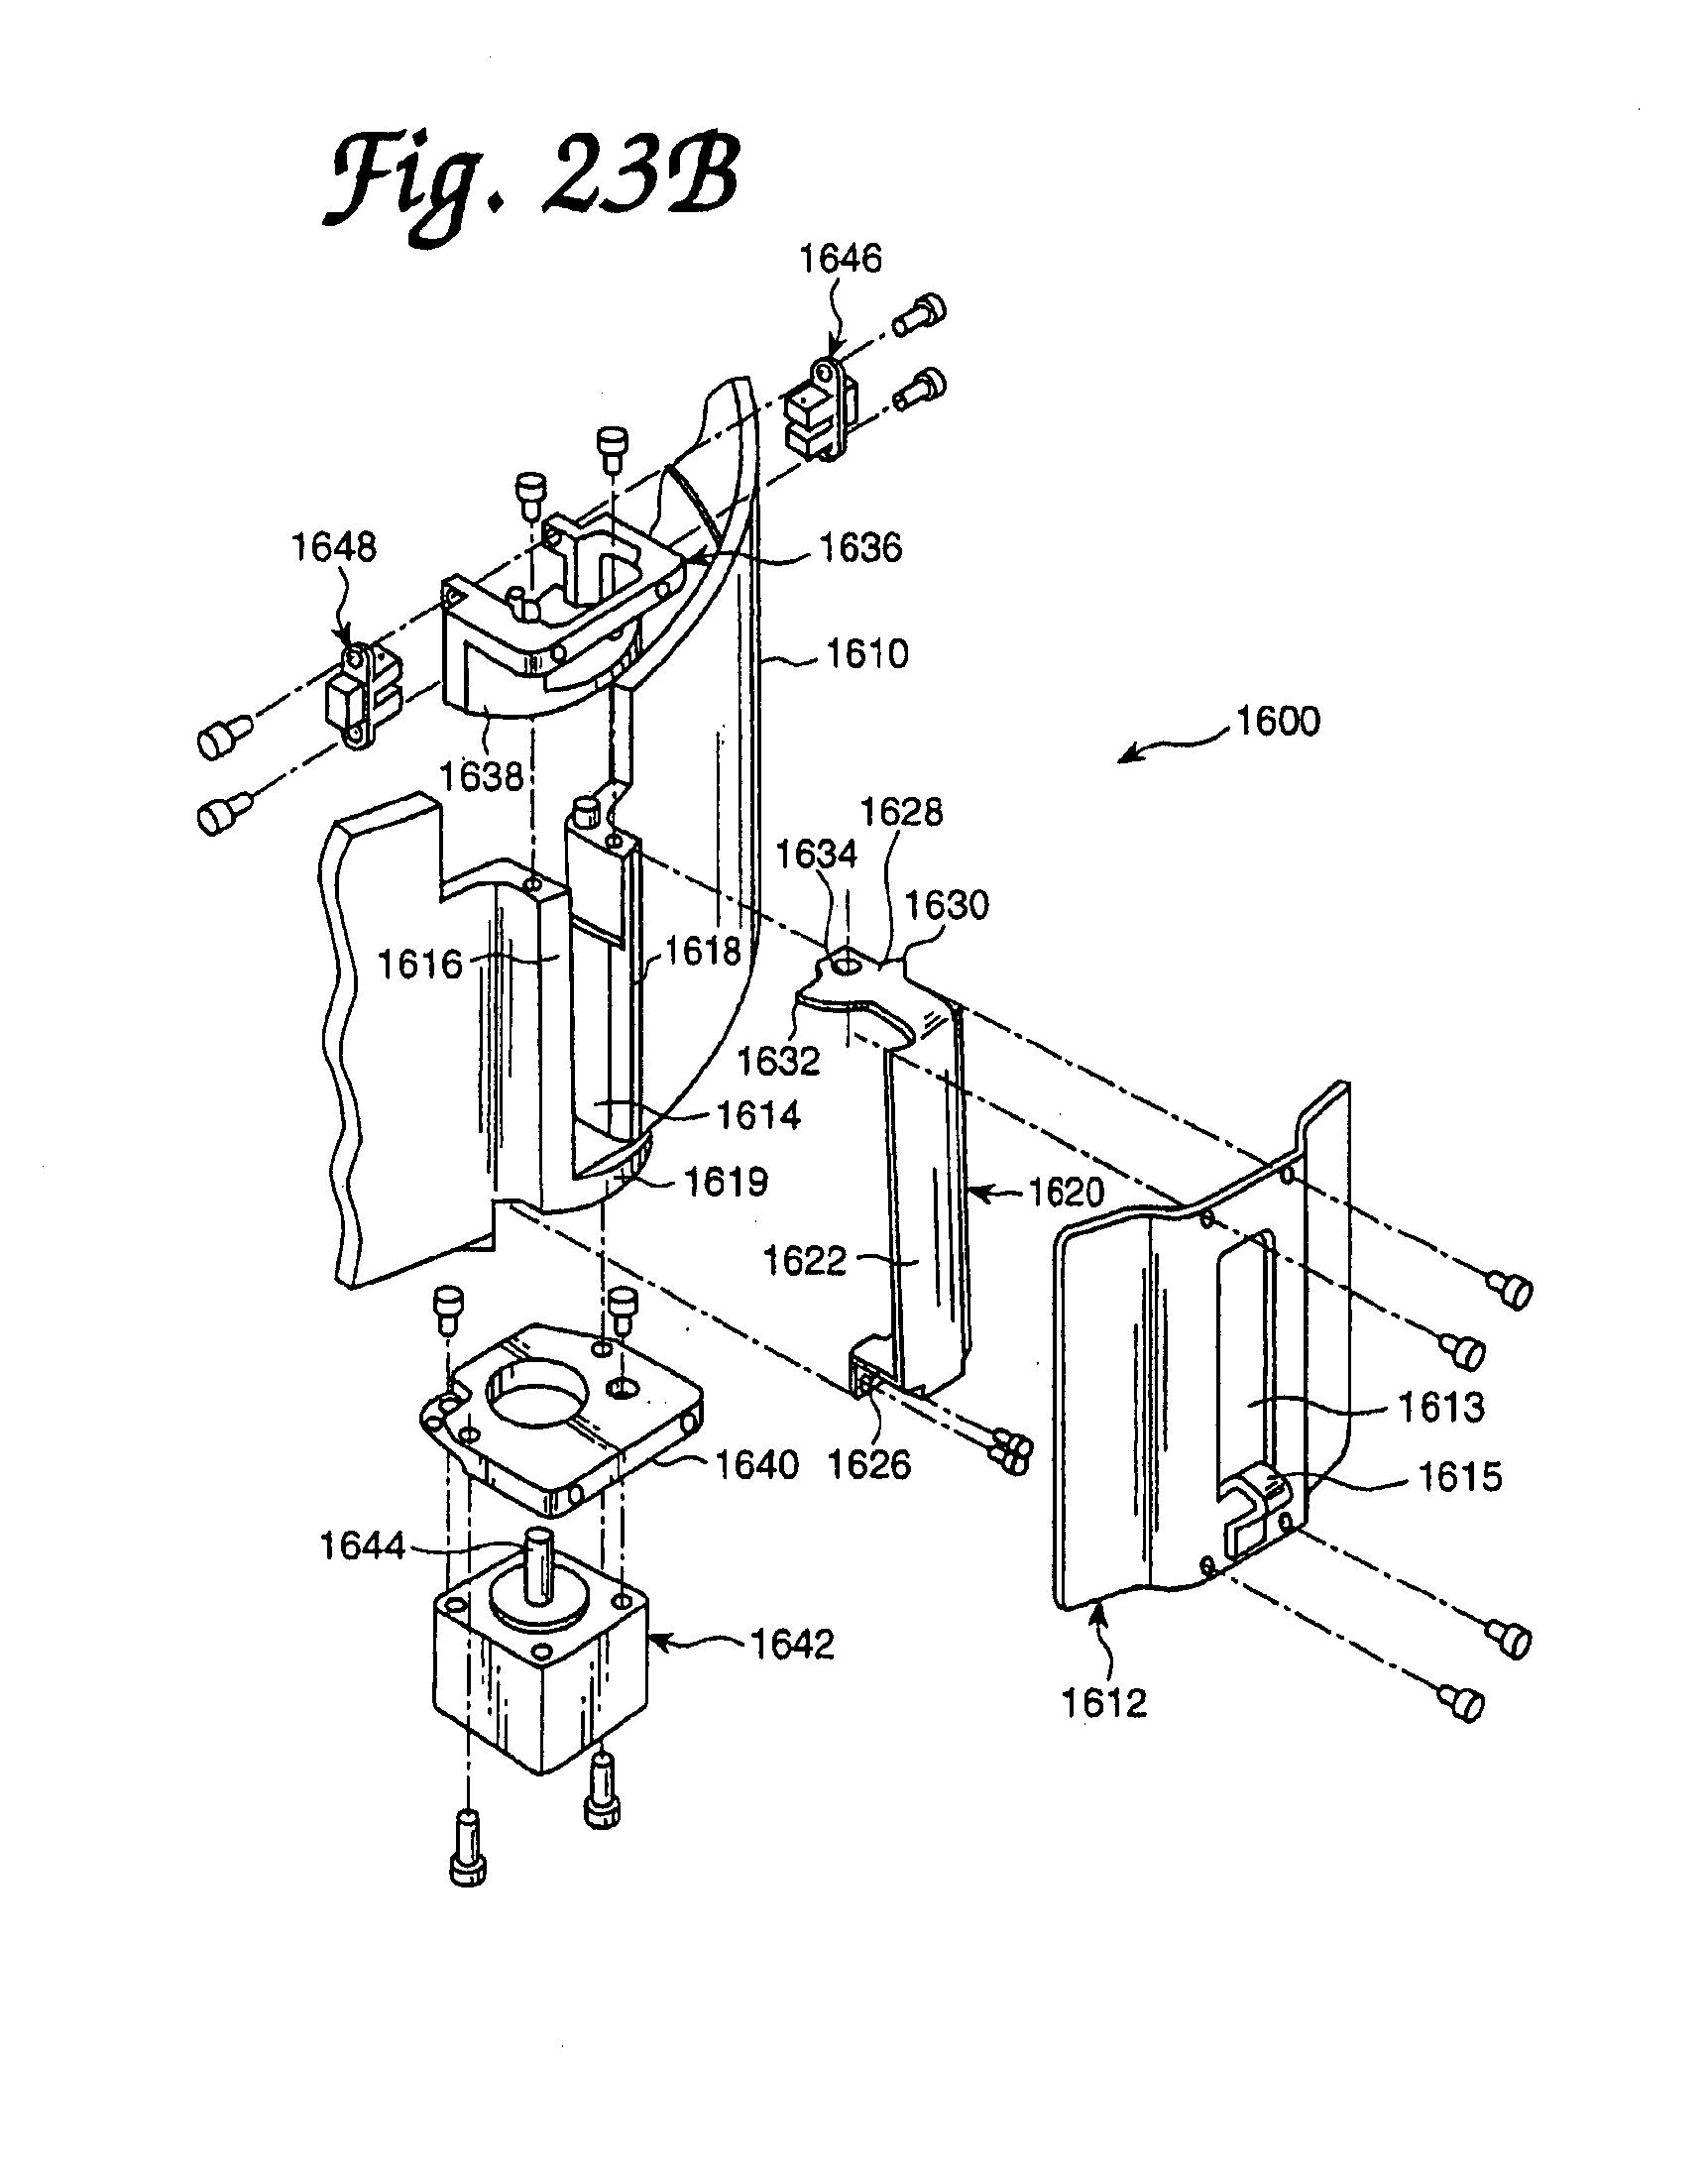 Ruff And Tuff Golf Cart Wiring Diagram : 38 Wiring Diagram